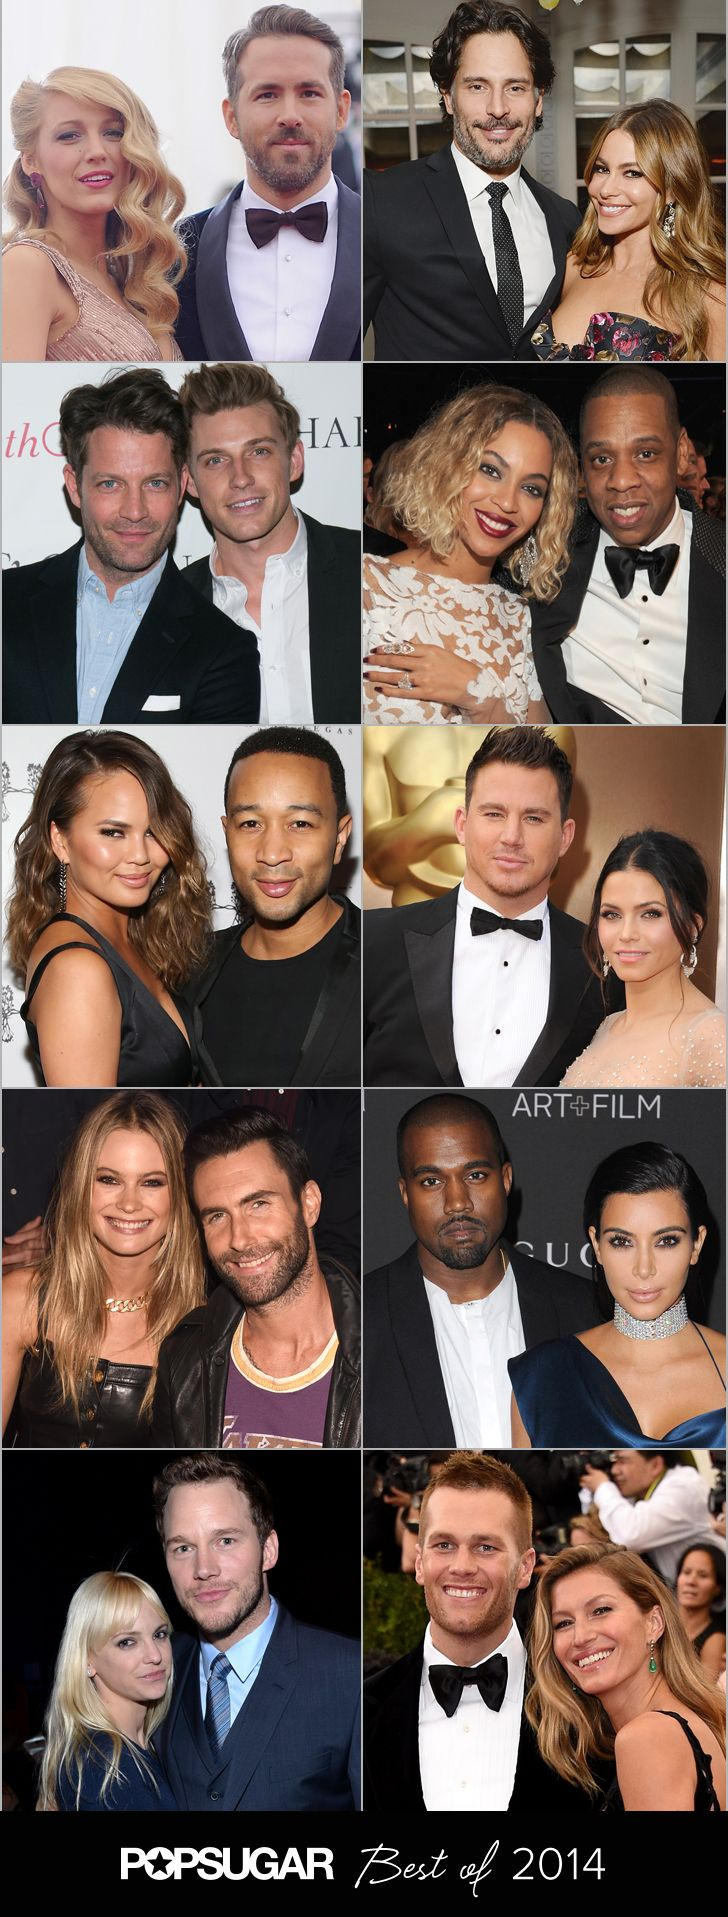 Best Celebrity Couples Ideas On Pinterest Cute Celebrity - 10 coolest celebrity power couples